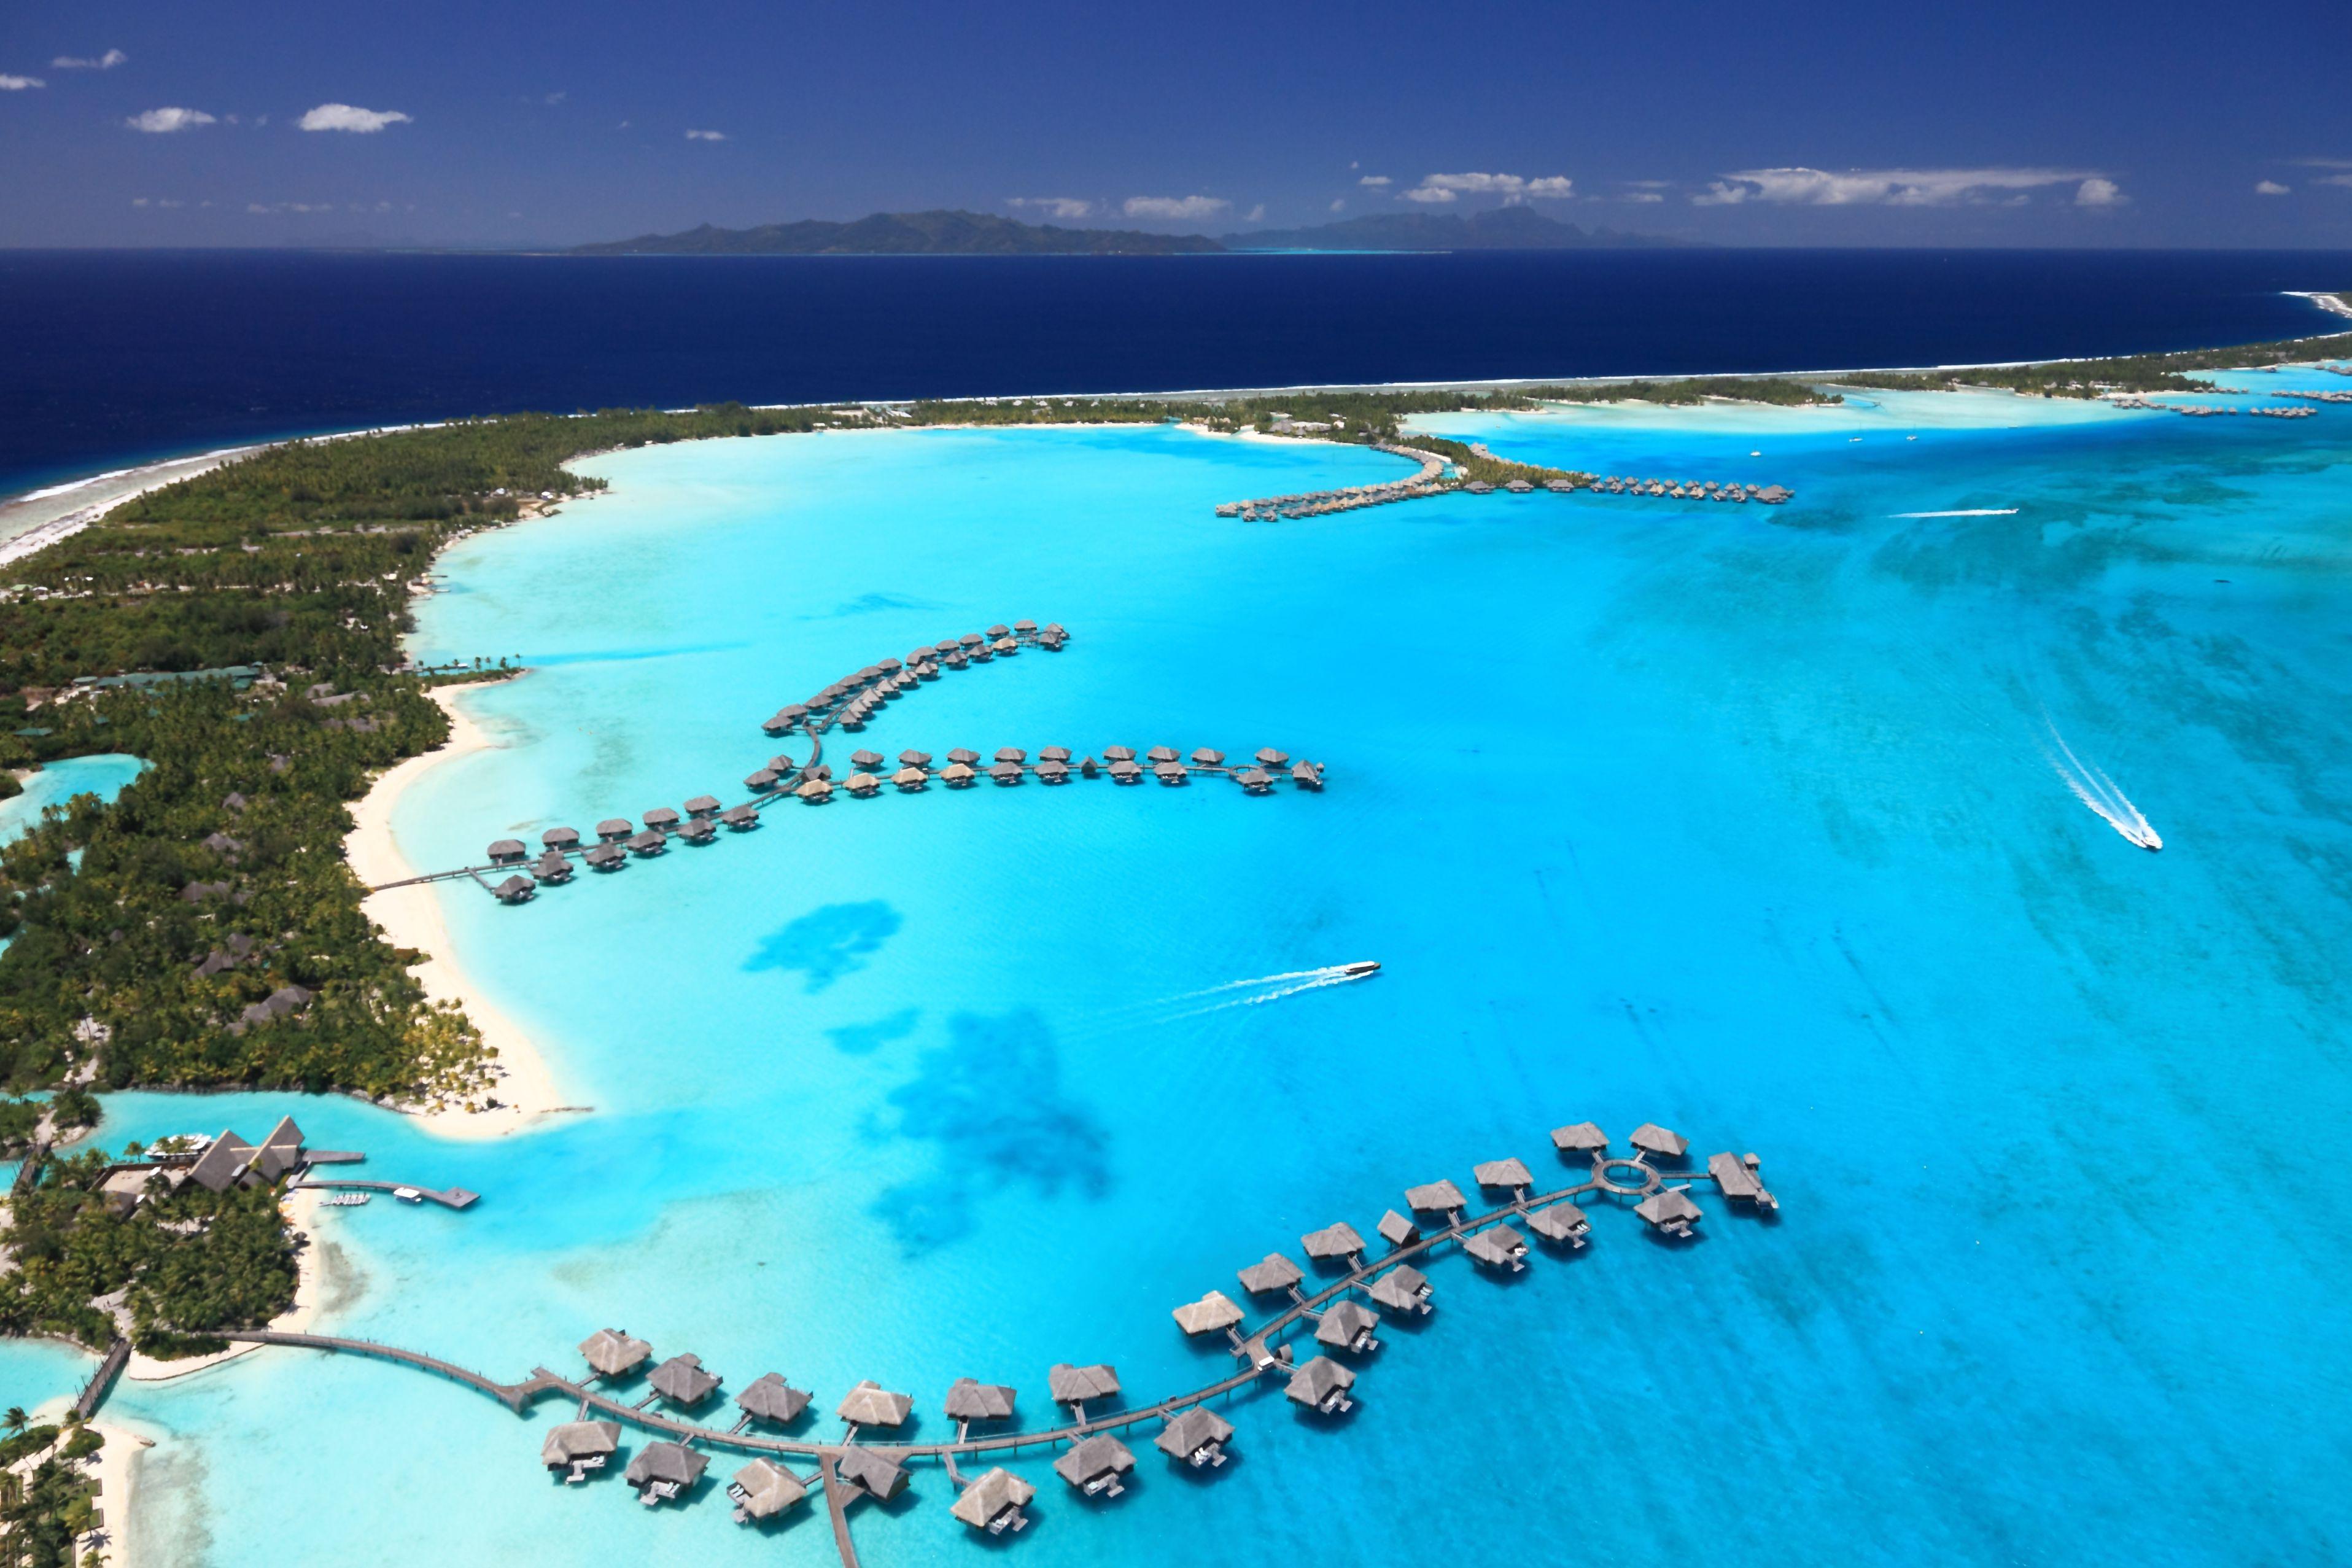 """Of French Polynesia's 118 islands, there are 11 go-to dive destinations: Bora Bora, Raiatea, Huahine, Moorea, Tahiti, Tikehau, Nuku Hiva, Tubuai, Rurutu, Rangiroa and Manihi."" © Achim Baqu"